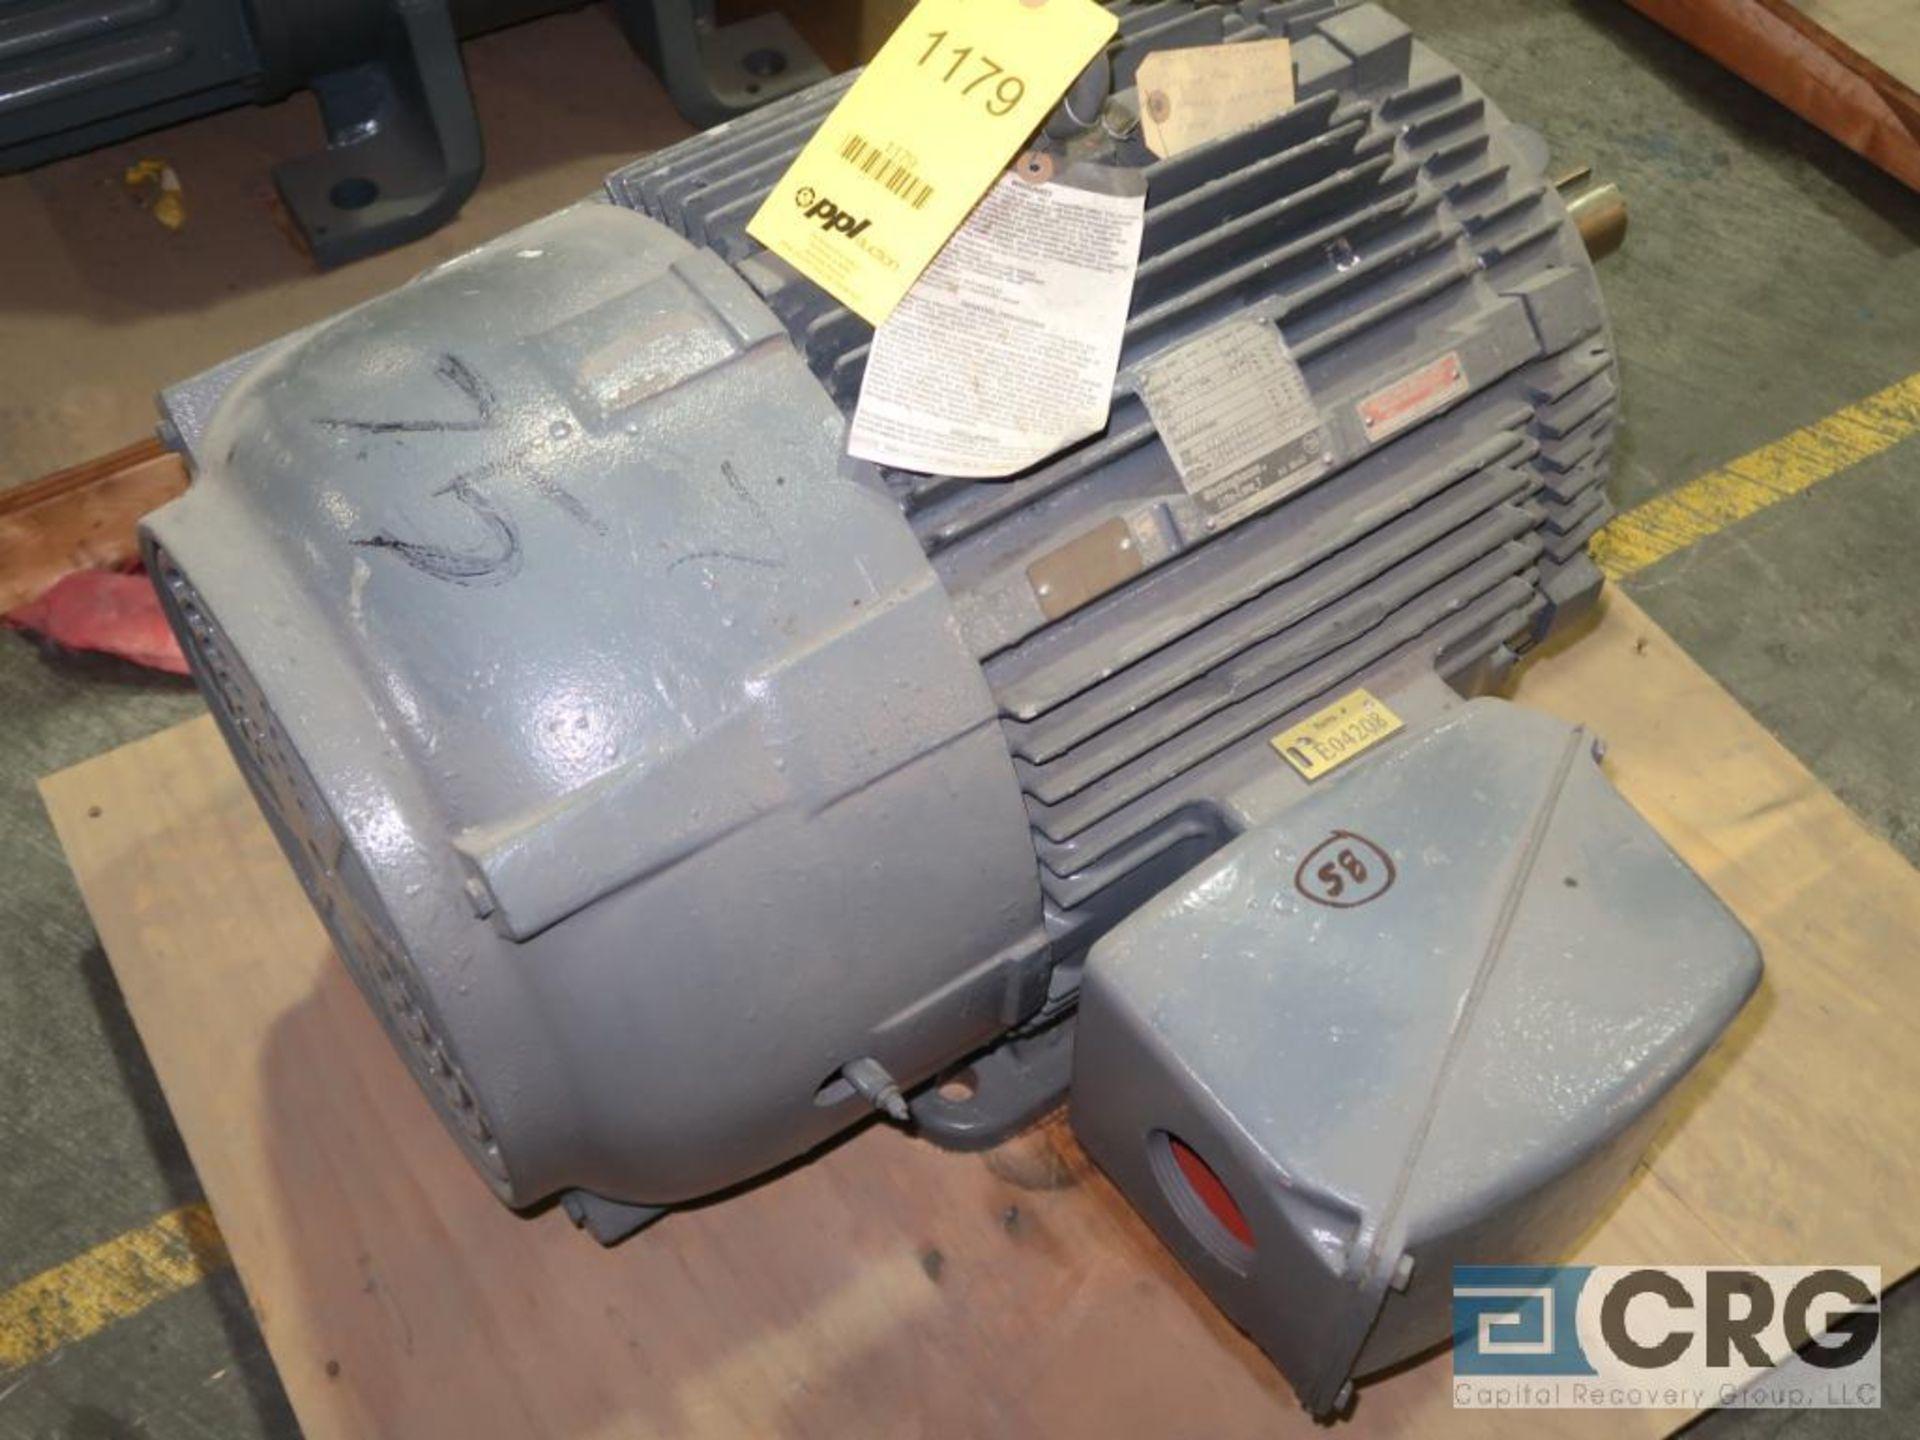 Westinghouse Life-Line T AC motor, 75 HP, 3,560 RPMs, 230/460 volt, 3 ph., 365T frame (Finish